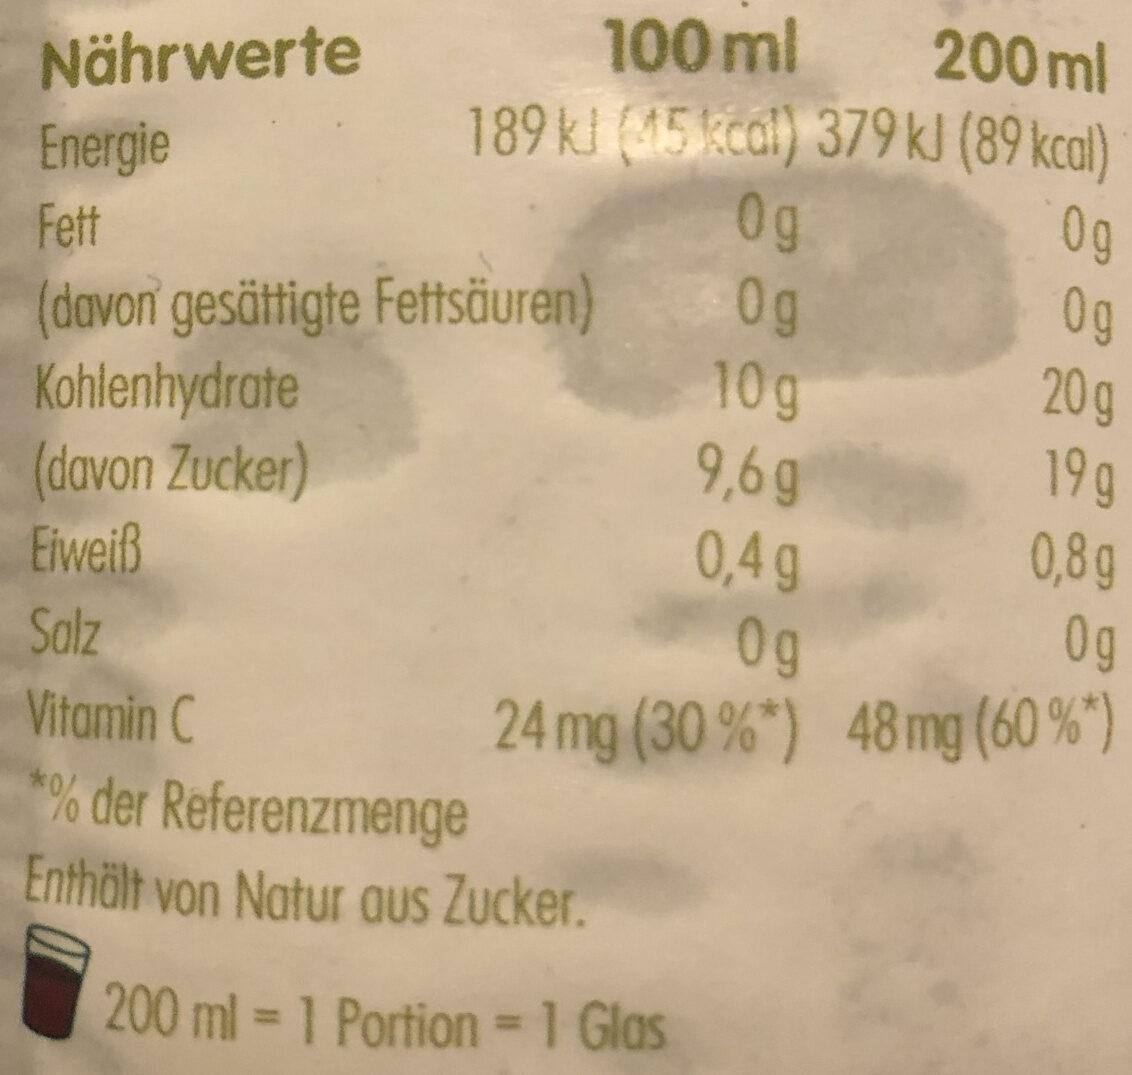 Apfel & Beeren Direktsaft - Valori nutrizionali - it